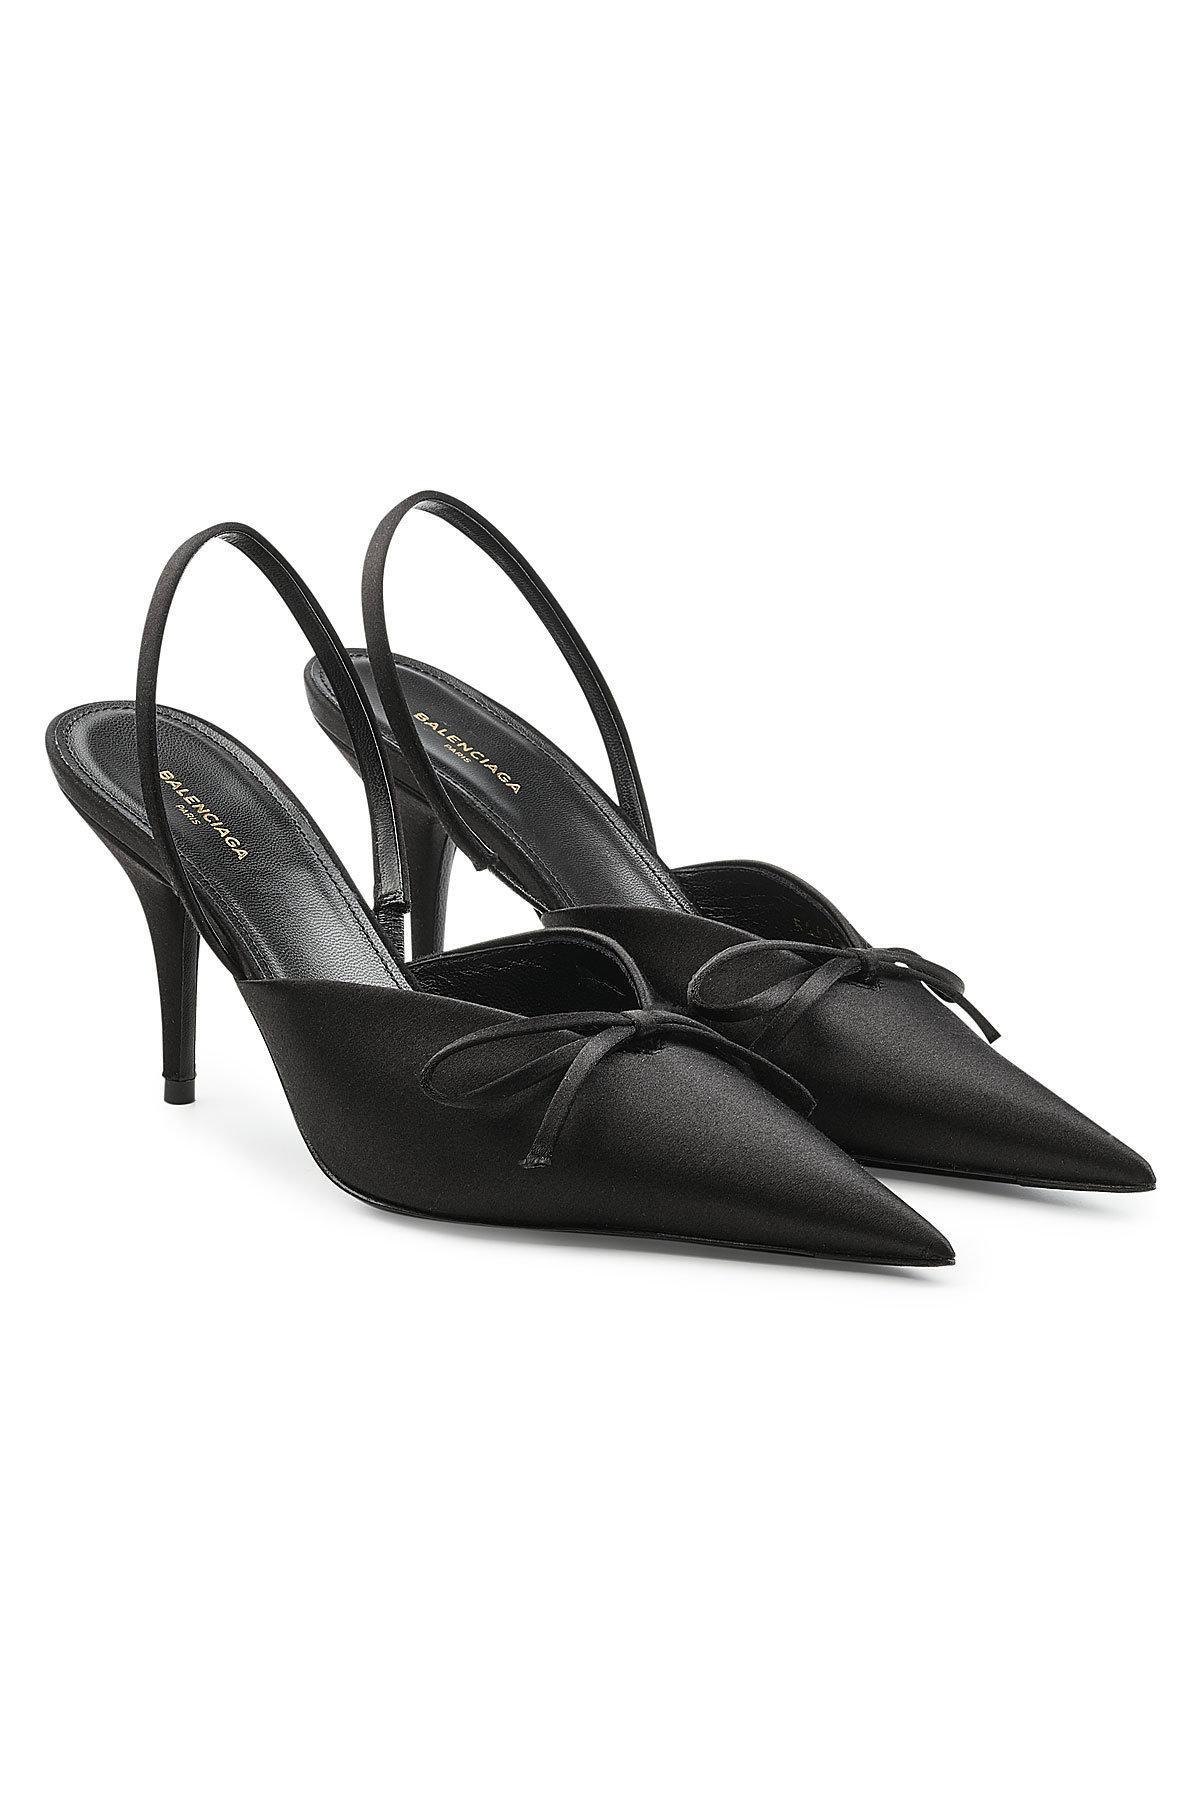 Balenciaga Black Satin Slingback Heels Footlocker Pas Cher En Ligne txRb1WX